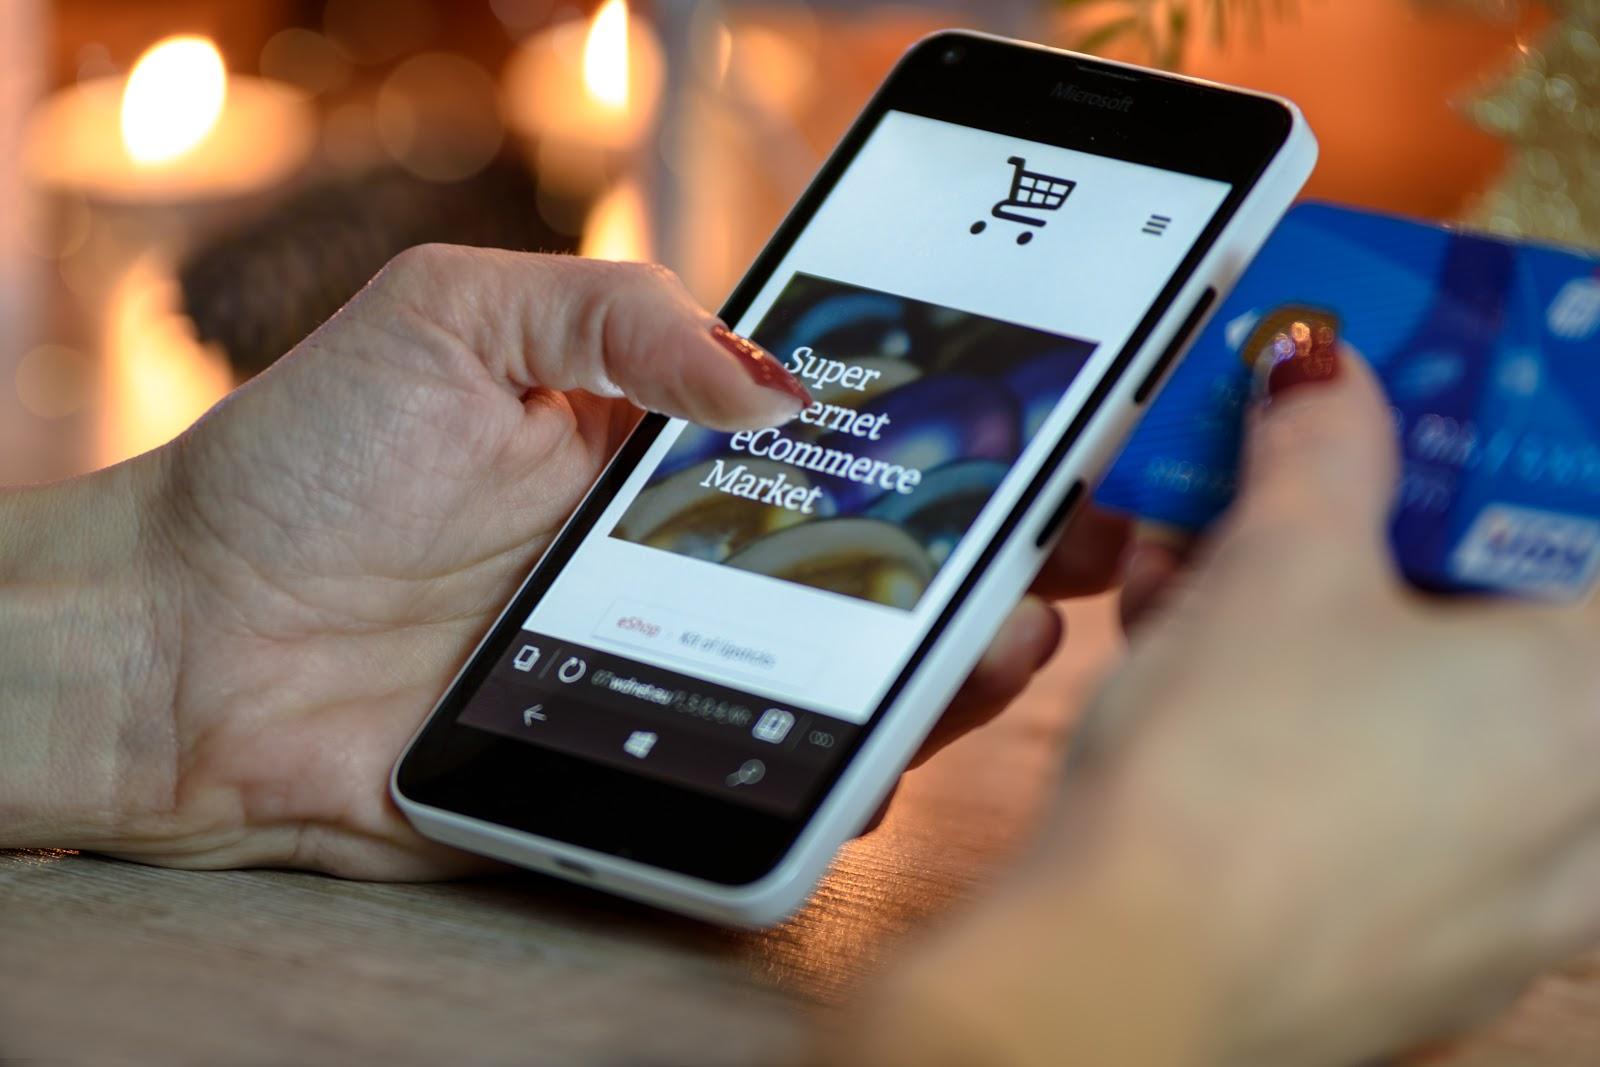 PUYsUGXGzhfet 325QAe9g3rwMpOraCBSCu3E2mTbj4 vXV The Top 10 Money-Saving Tips When Shopping Online